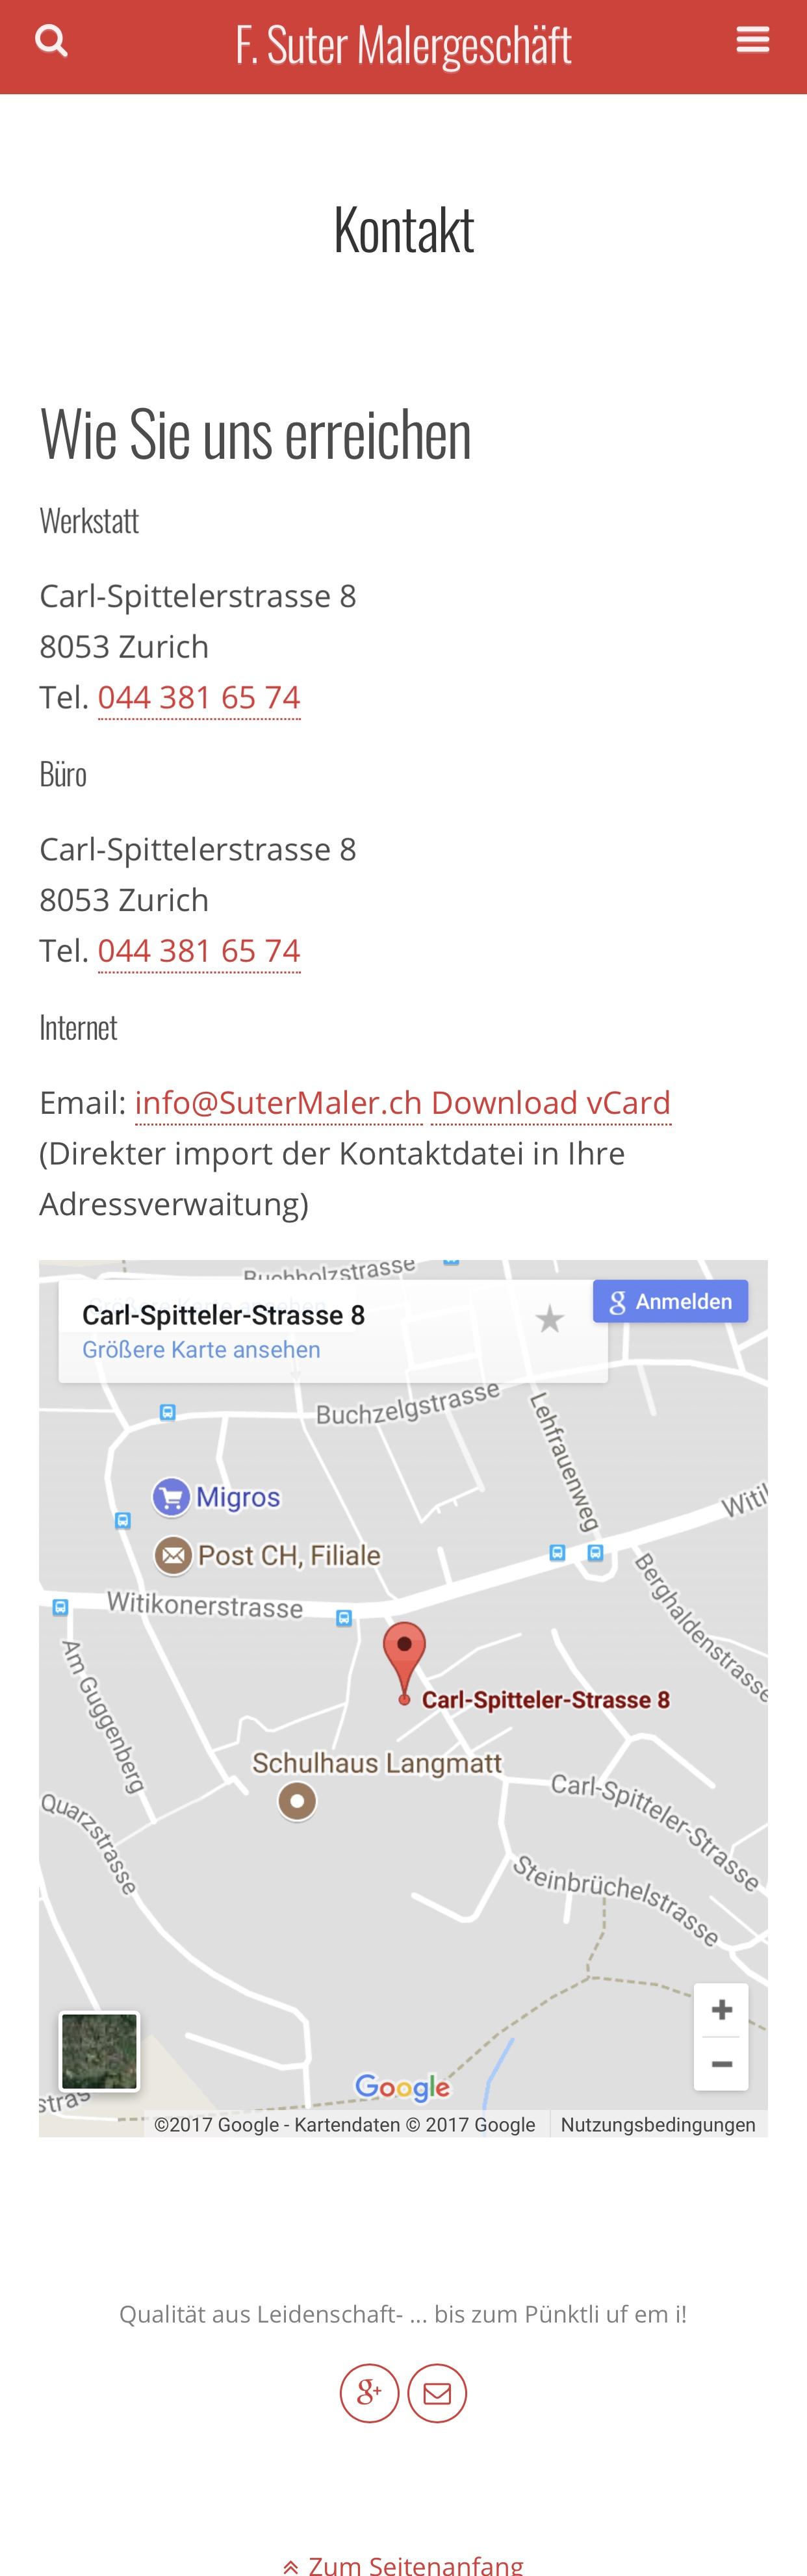 Kontakt-classic-mobile.jpg